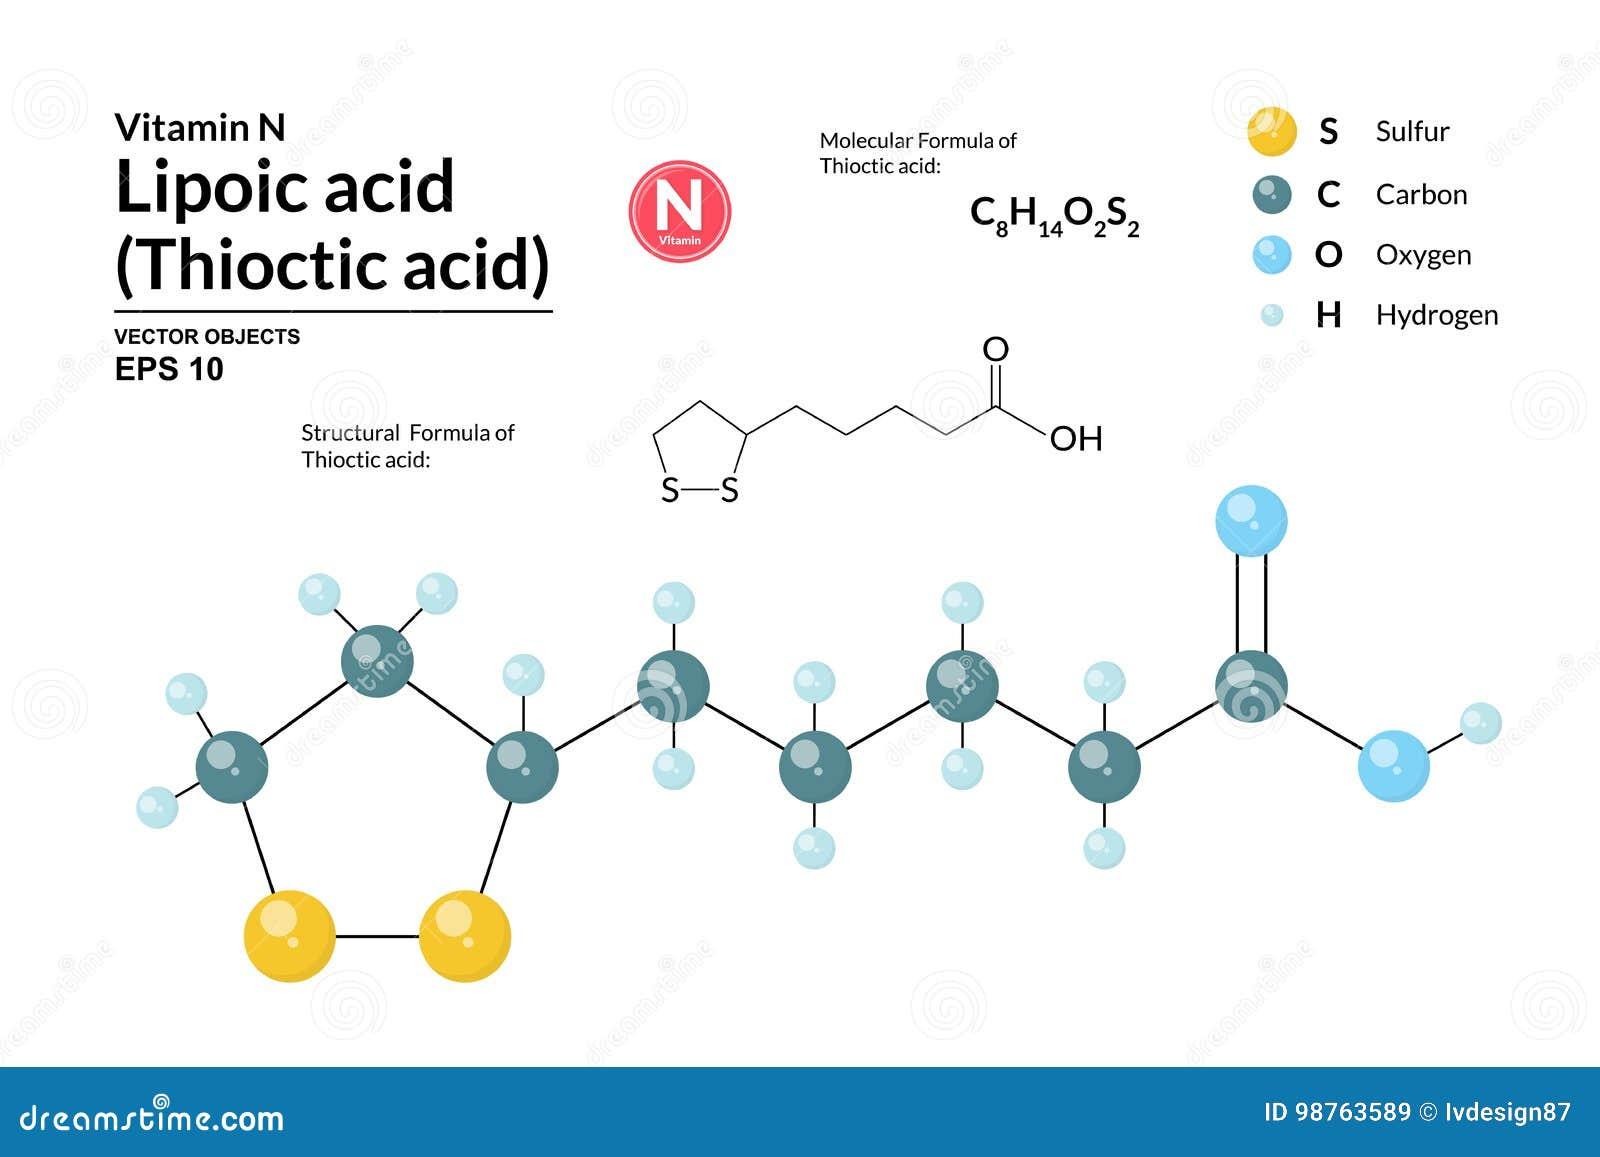 3d Oxygen Atom Diagram Spheres Represent Carbon Atoms Wire Data Structural Chemical Molecular Formula And Model Of Lipoic Acid Rh Dreamstime Com